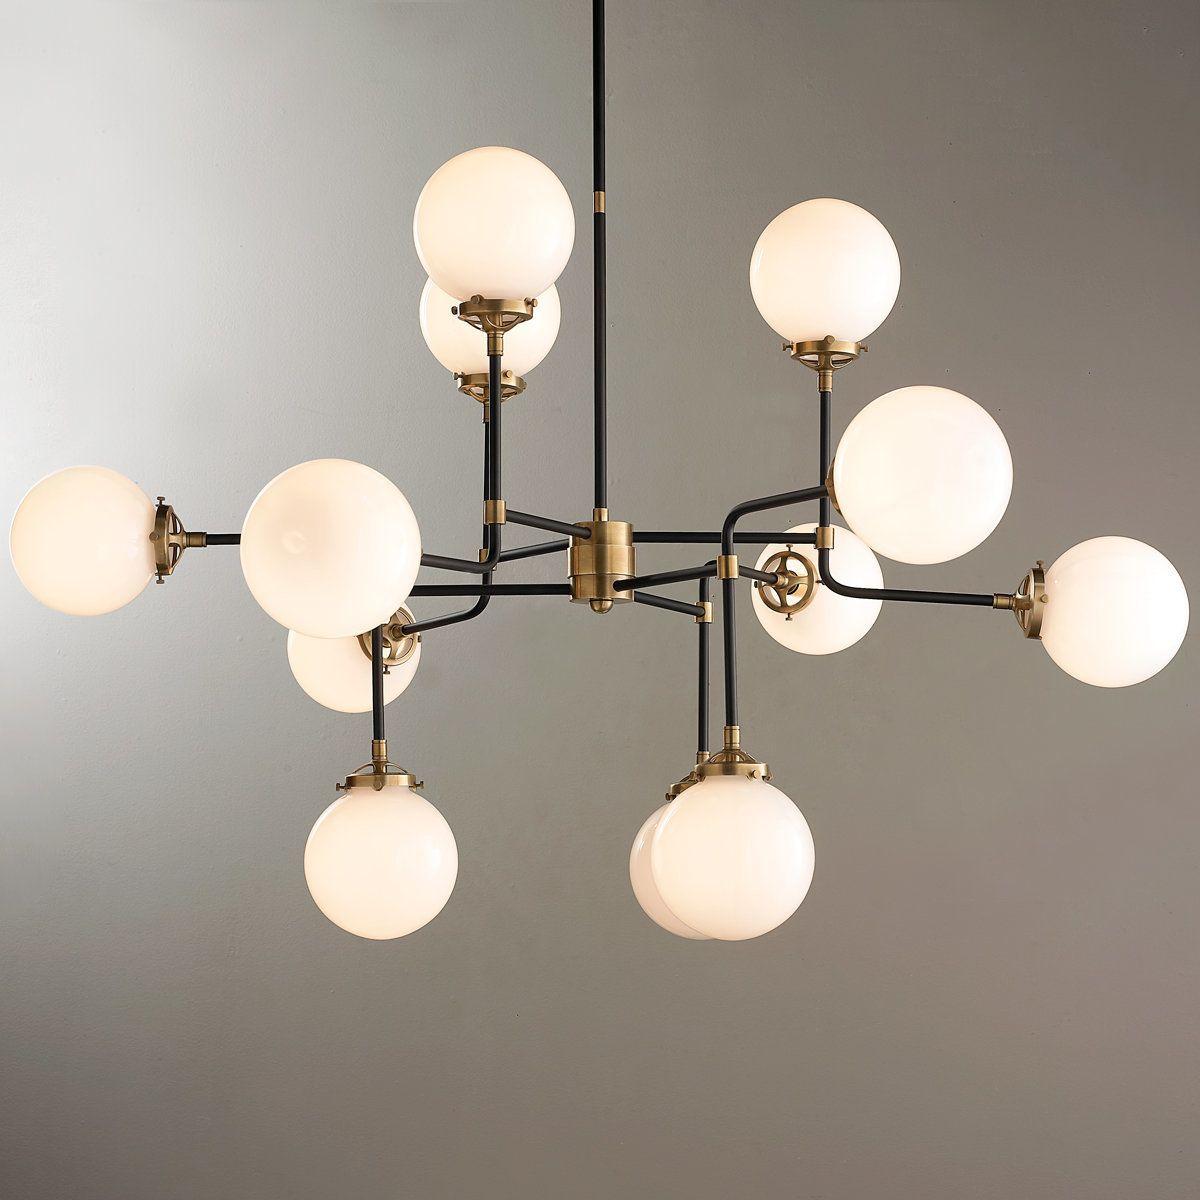 Narrow hallway lighting ideas  MidCentury Parlor Chandelier  Parlour Antique brass and Mid century